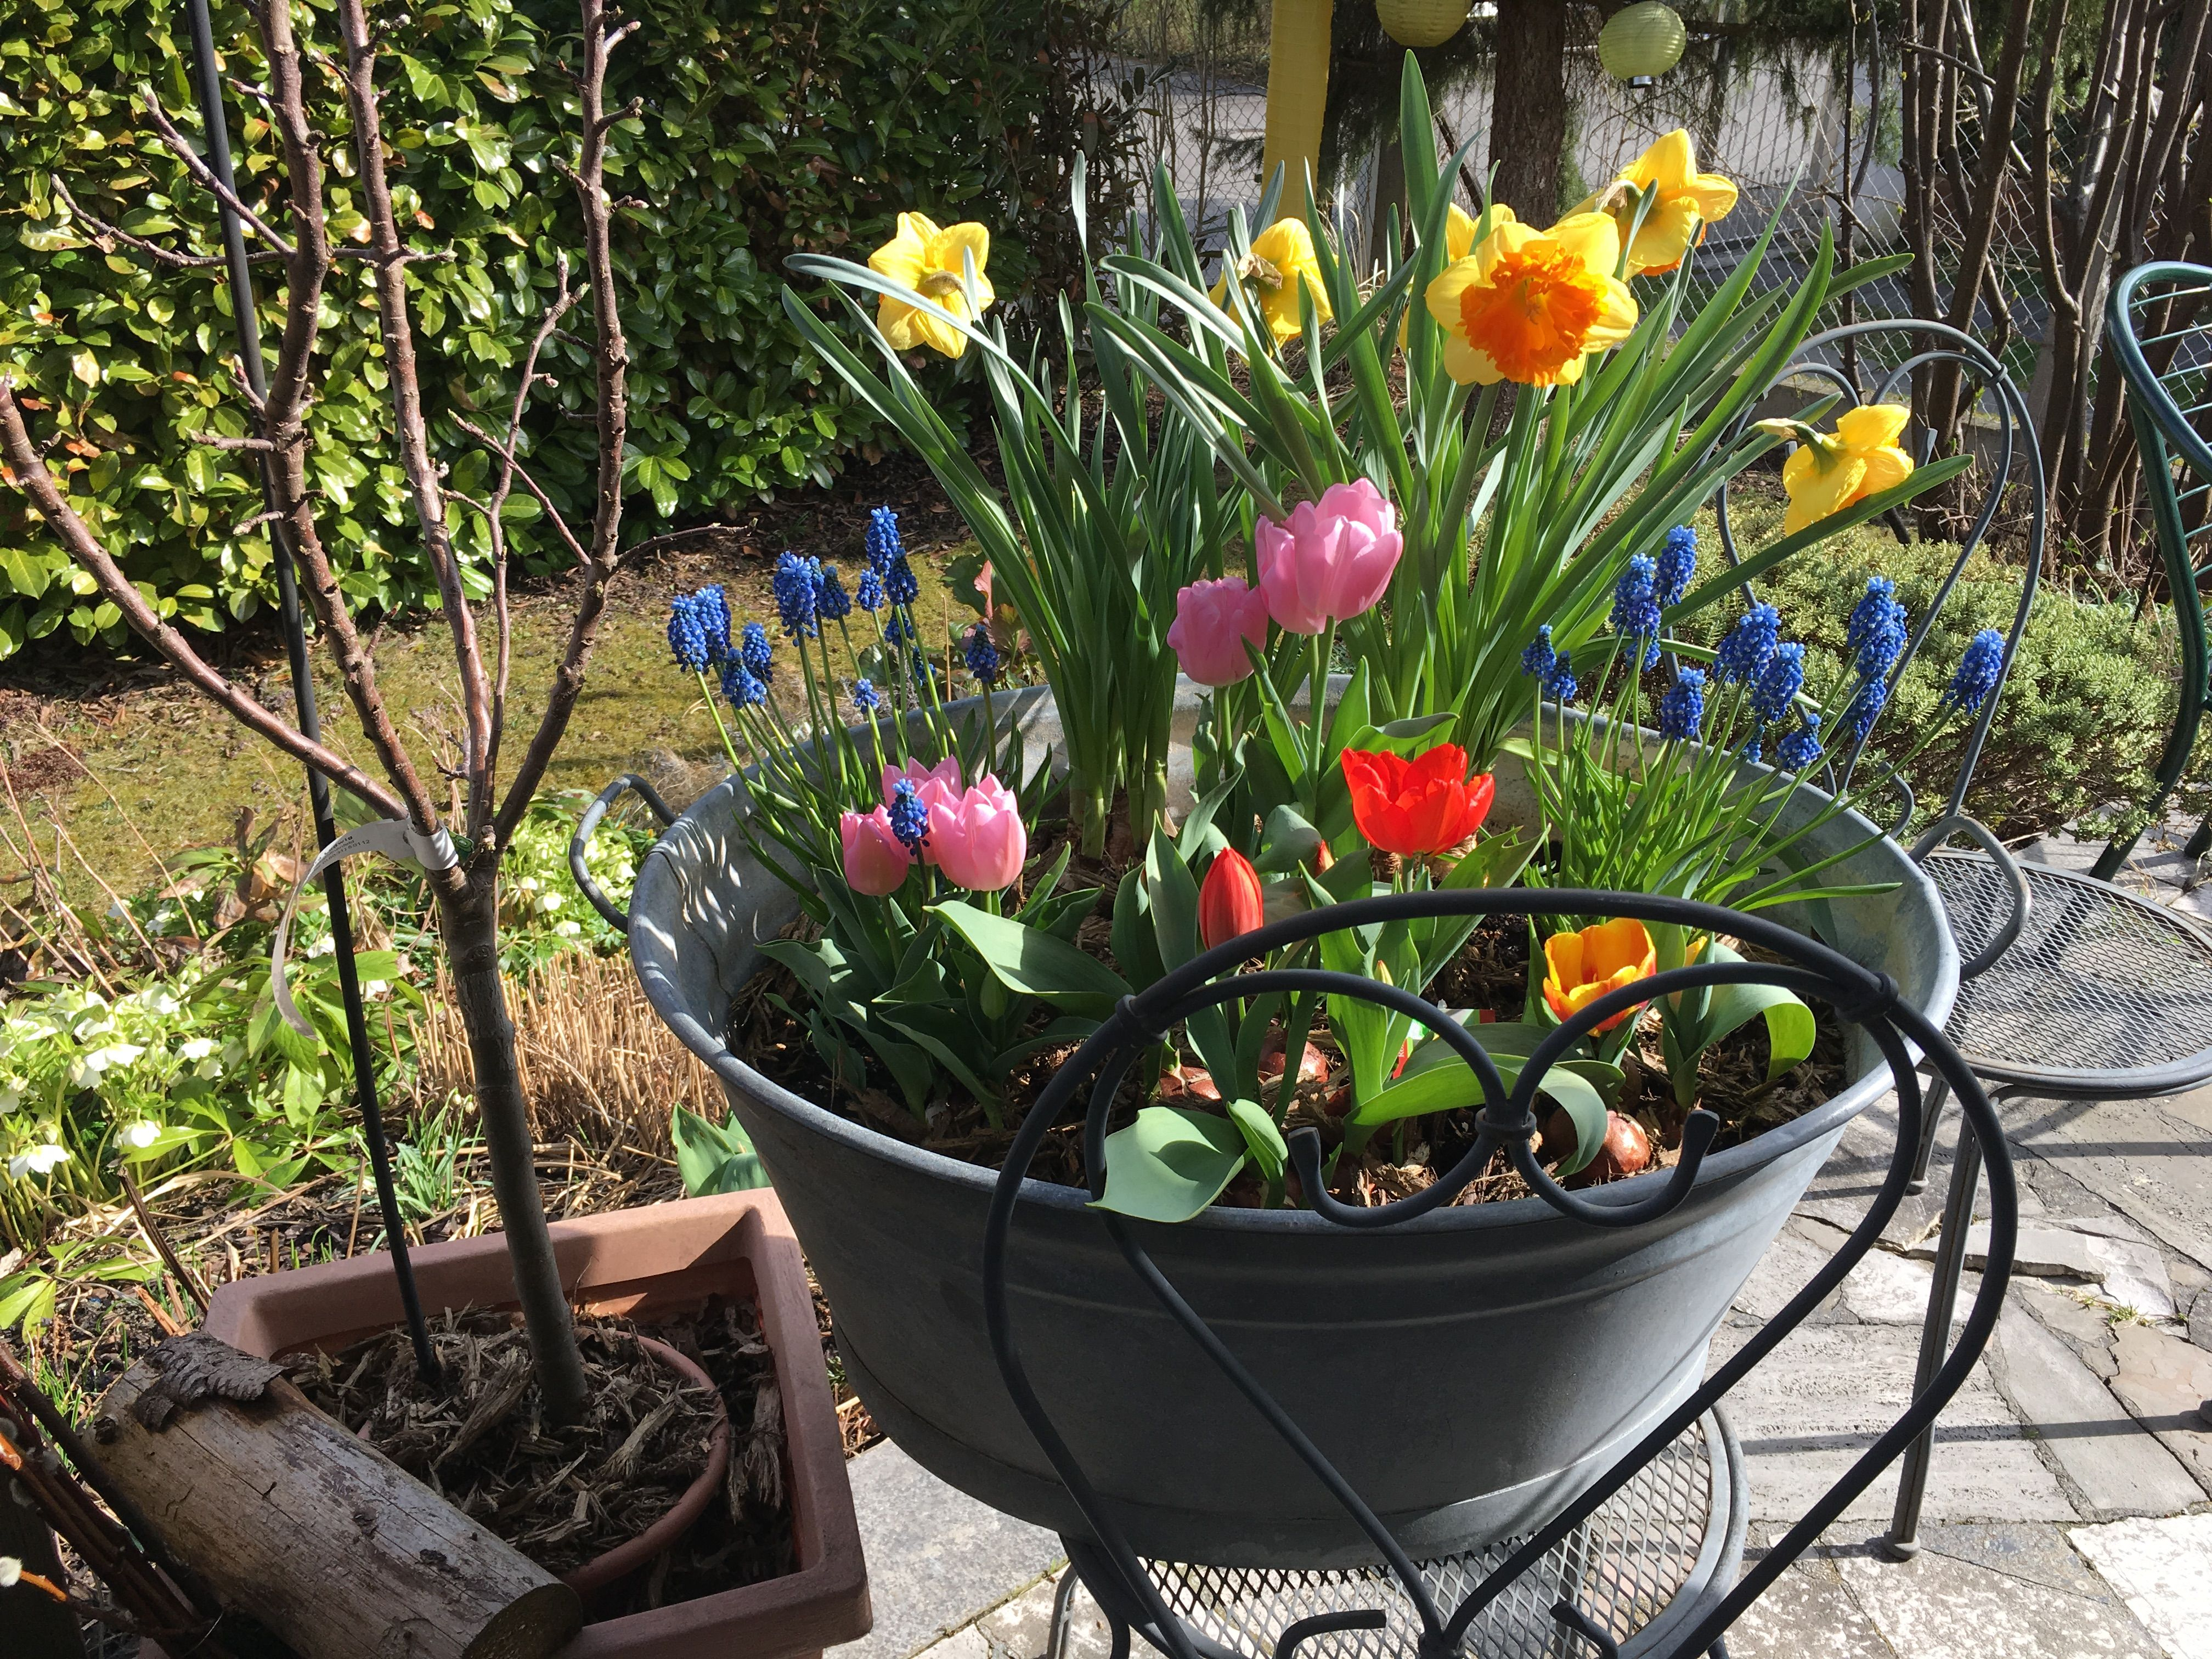 Frühling in der Wanne 😍